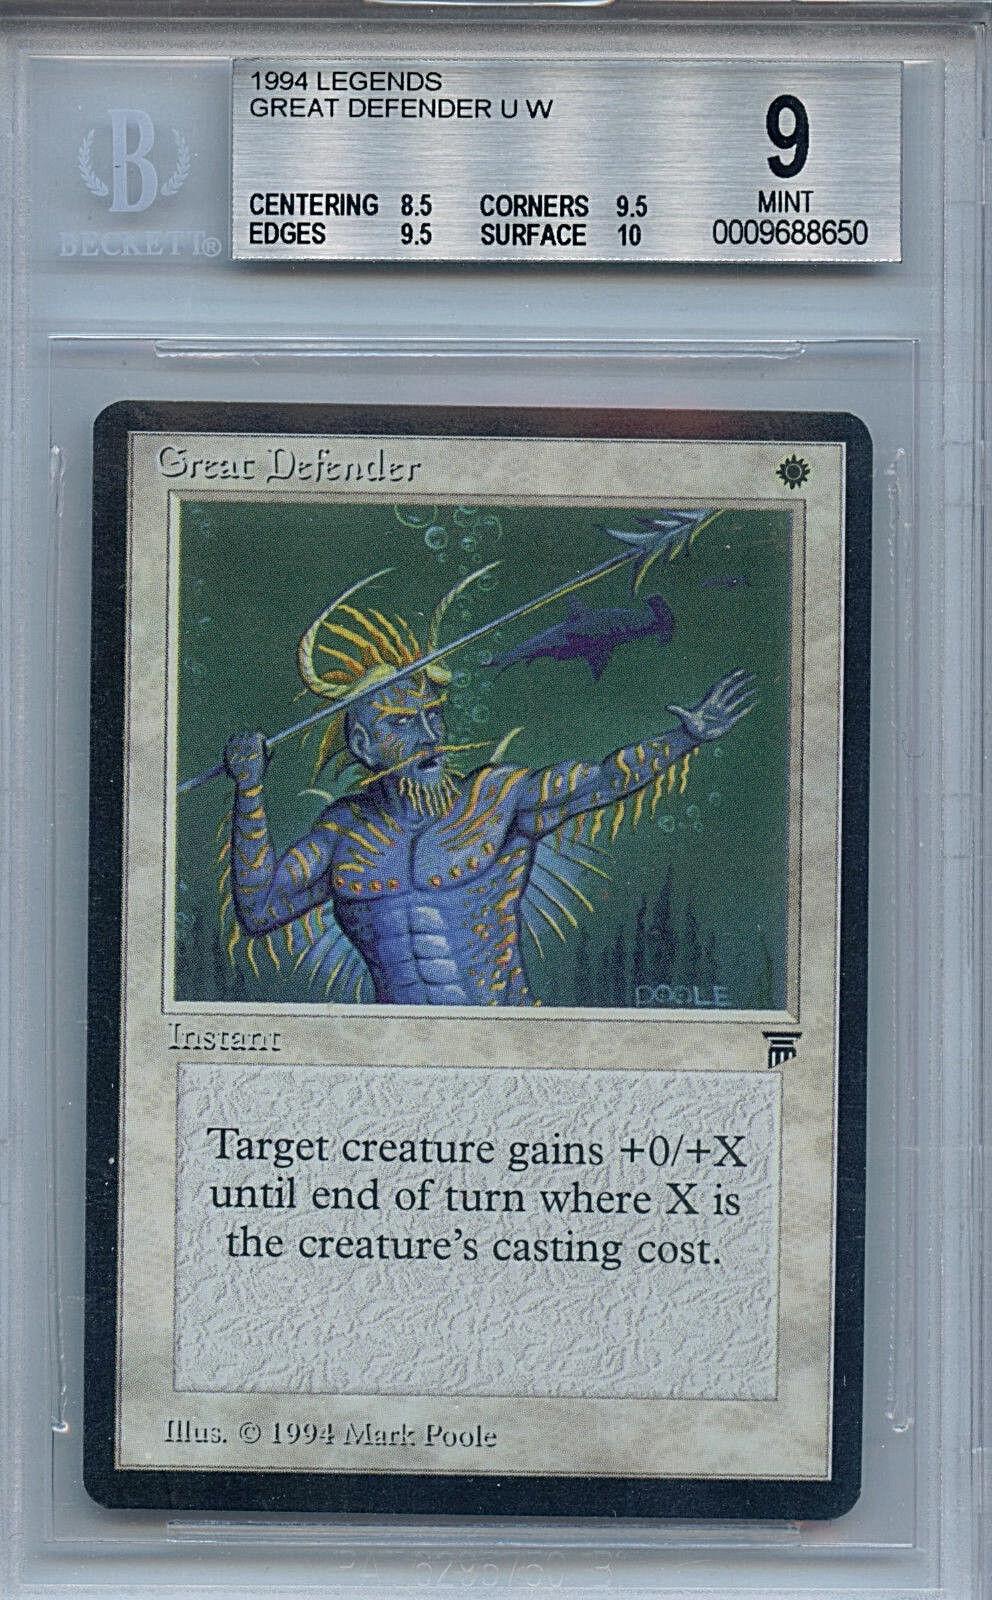 Mtg - legenden großer Grüneidiger bgs 9,0 (9) - karte magic the gathering 8.650